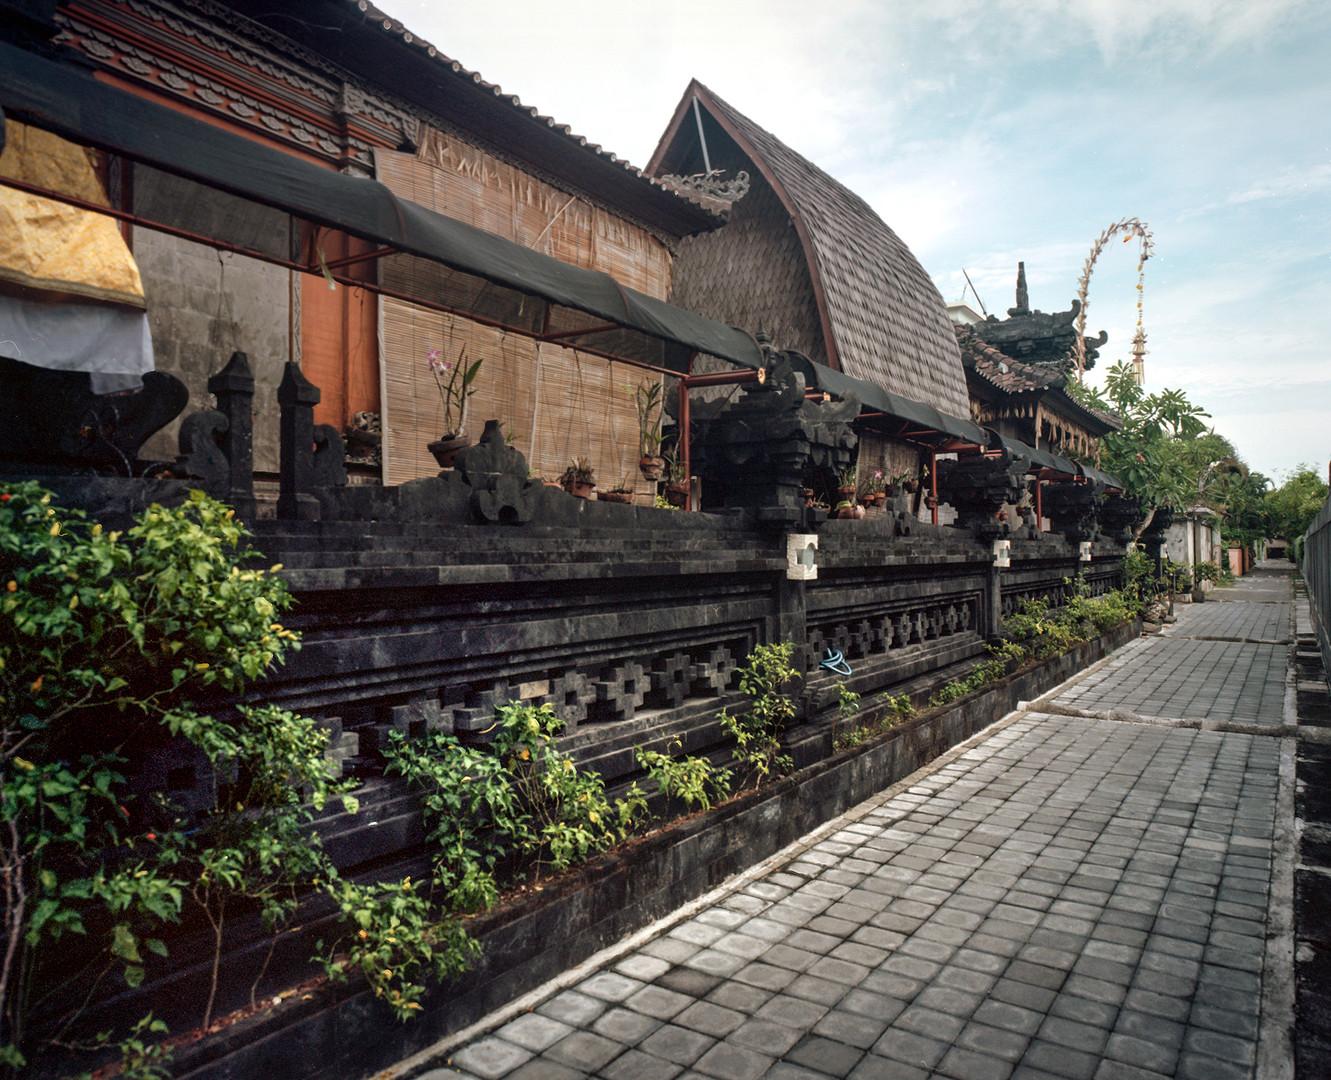 Goodman-zone-camera-shots-Bali-10.jpg